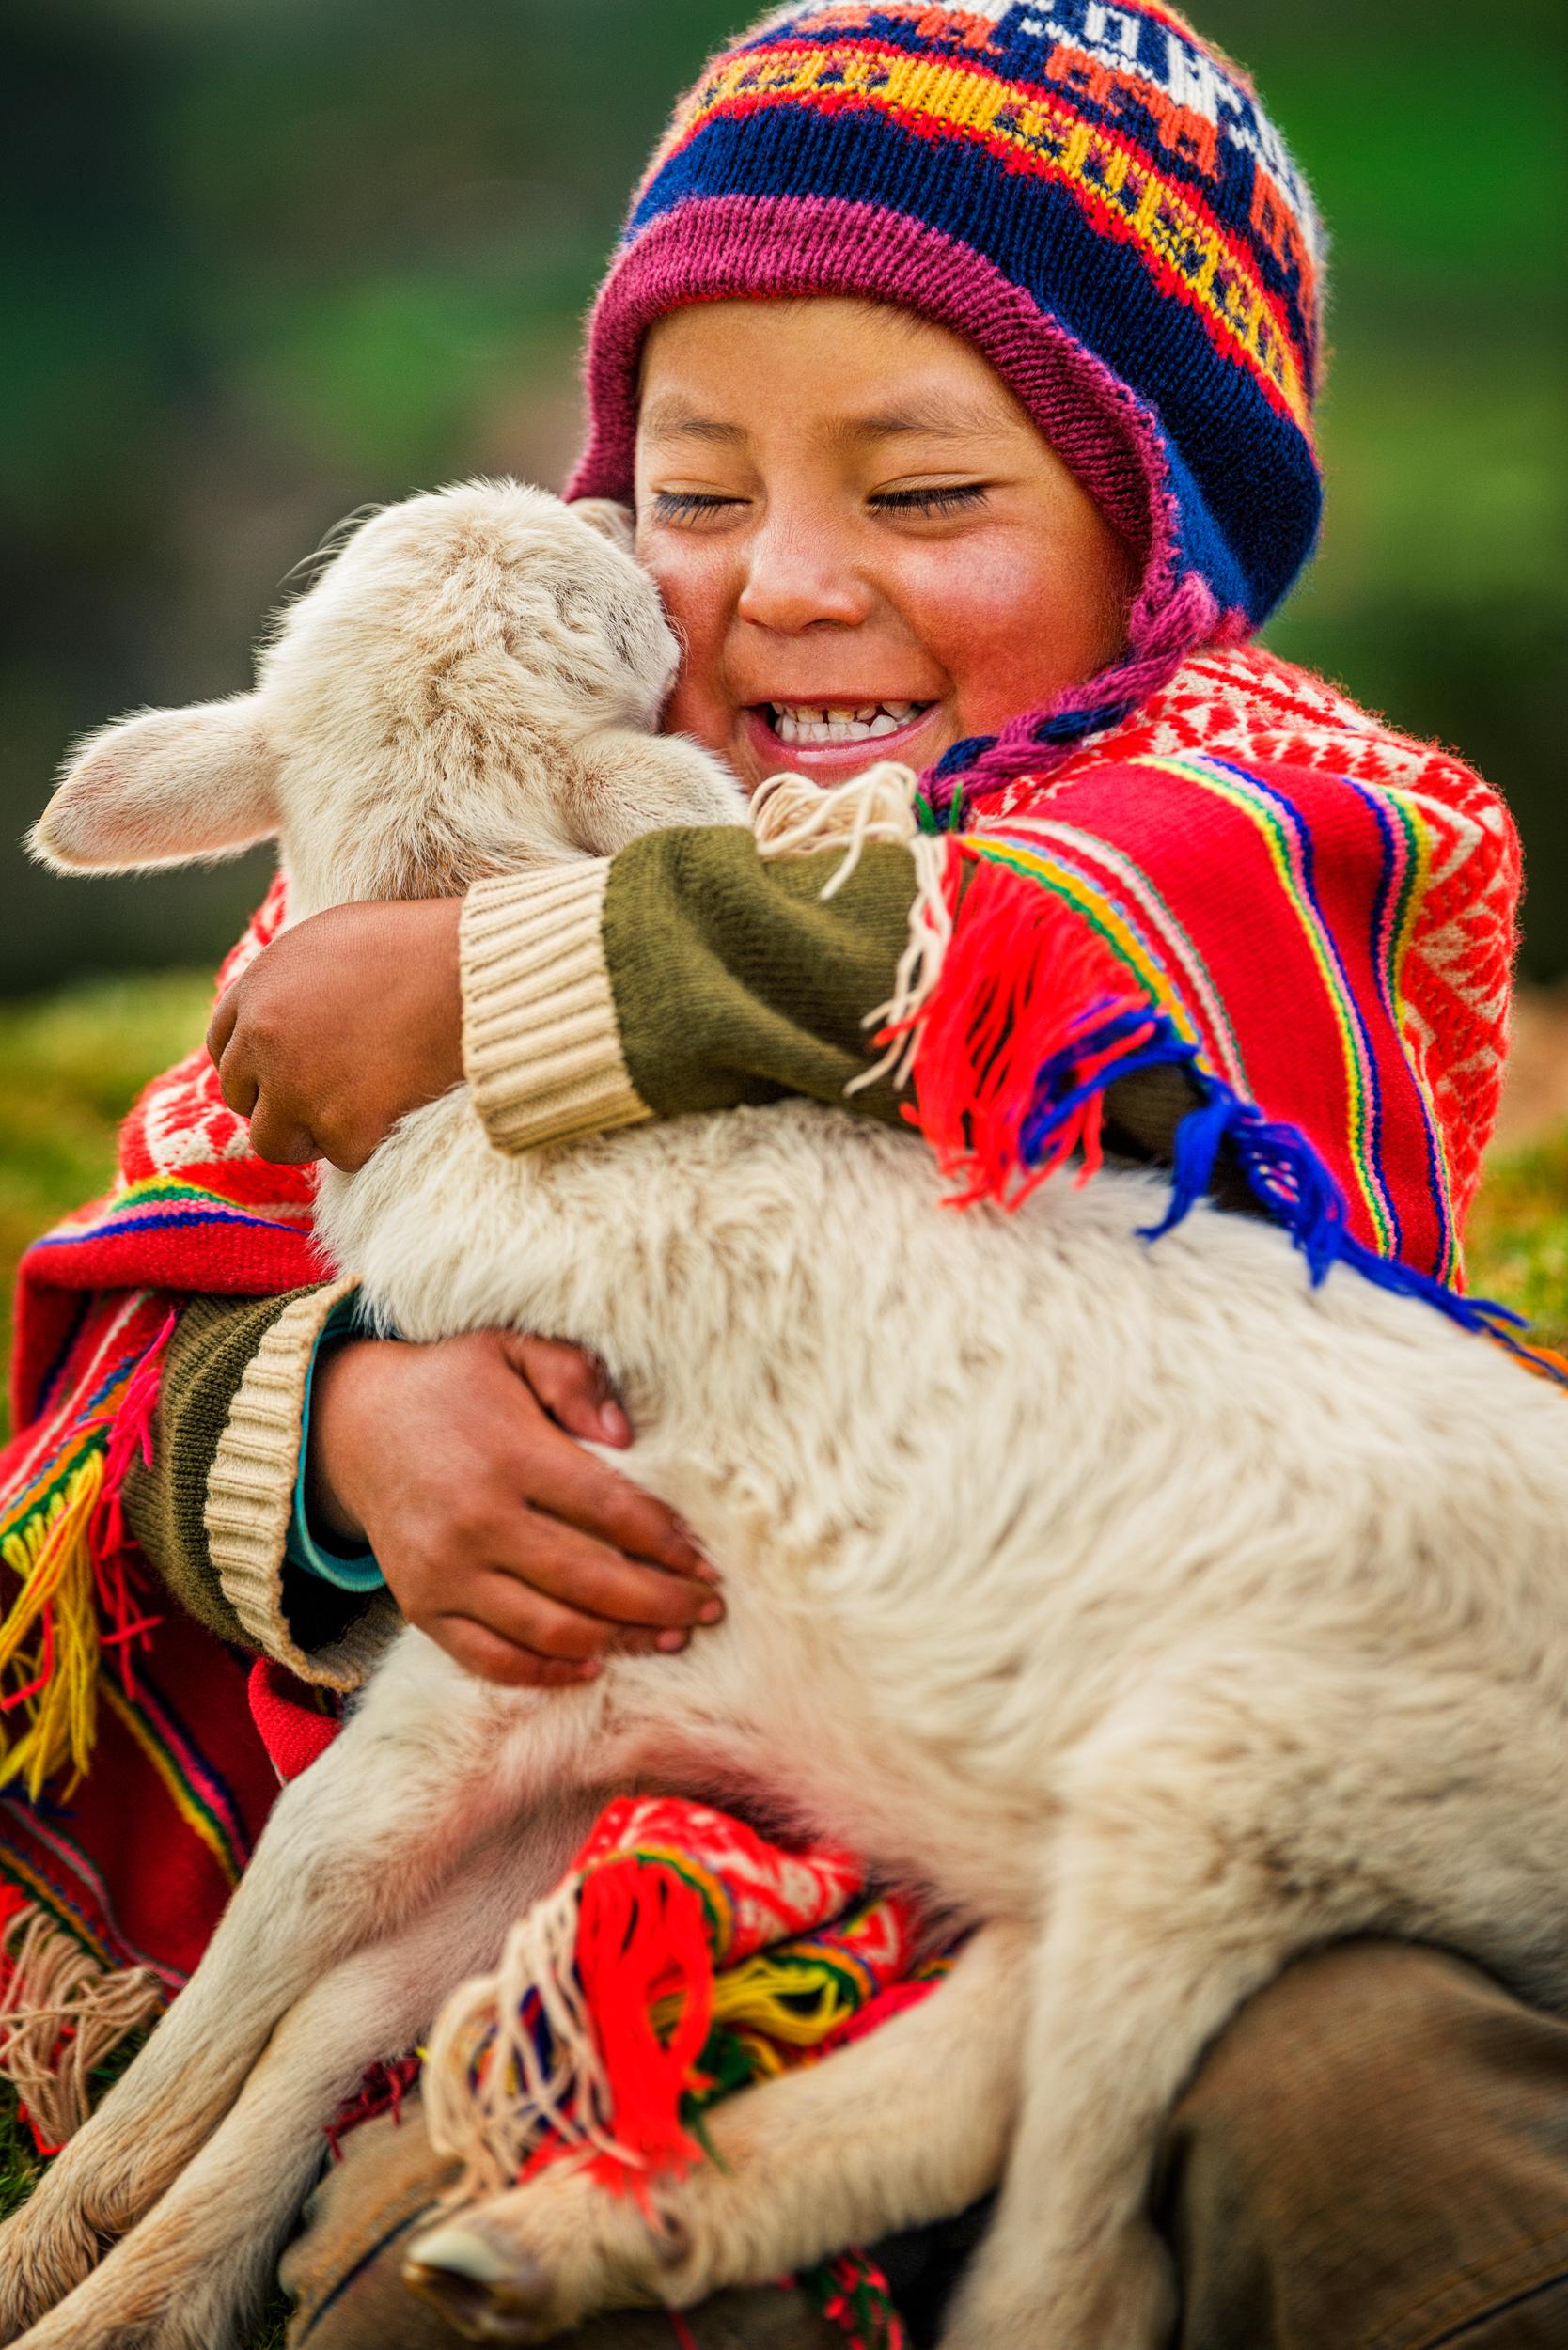 Spyrides_Kyle_Peruvian_Boy+Sheep_1_DSC8463 copy.jpg